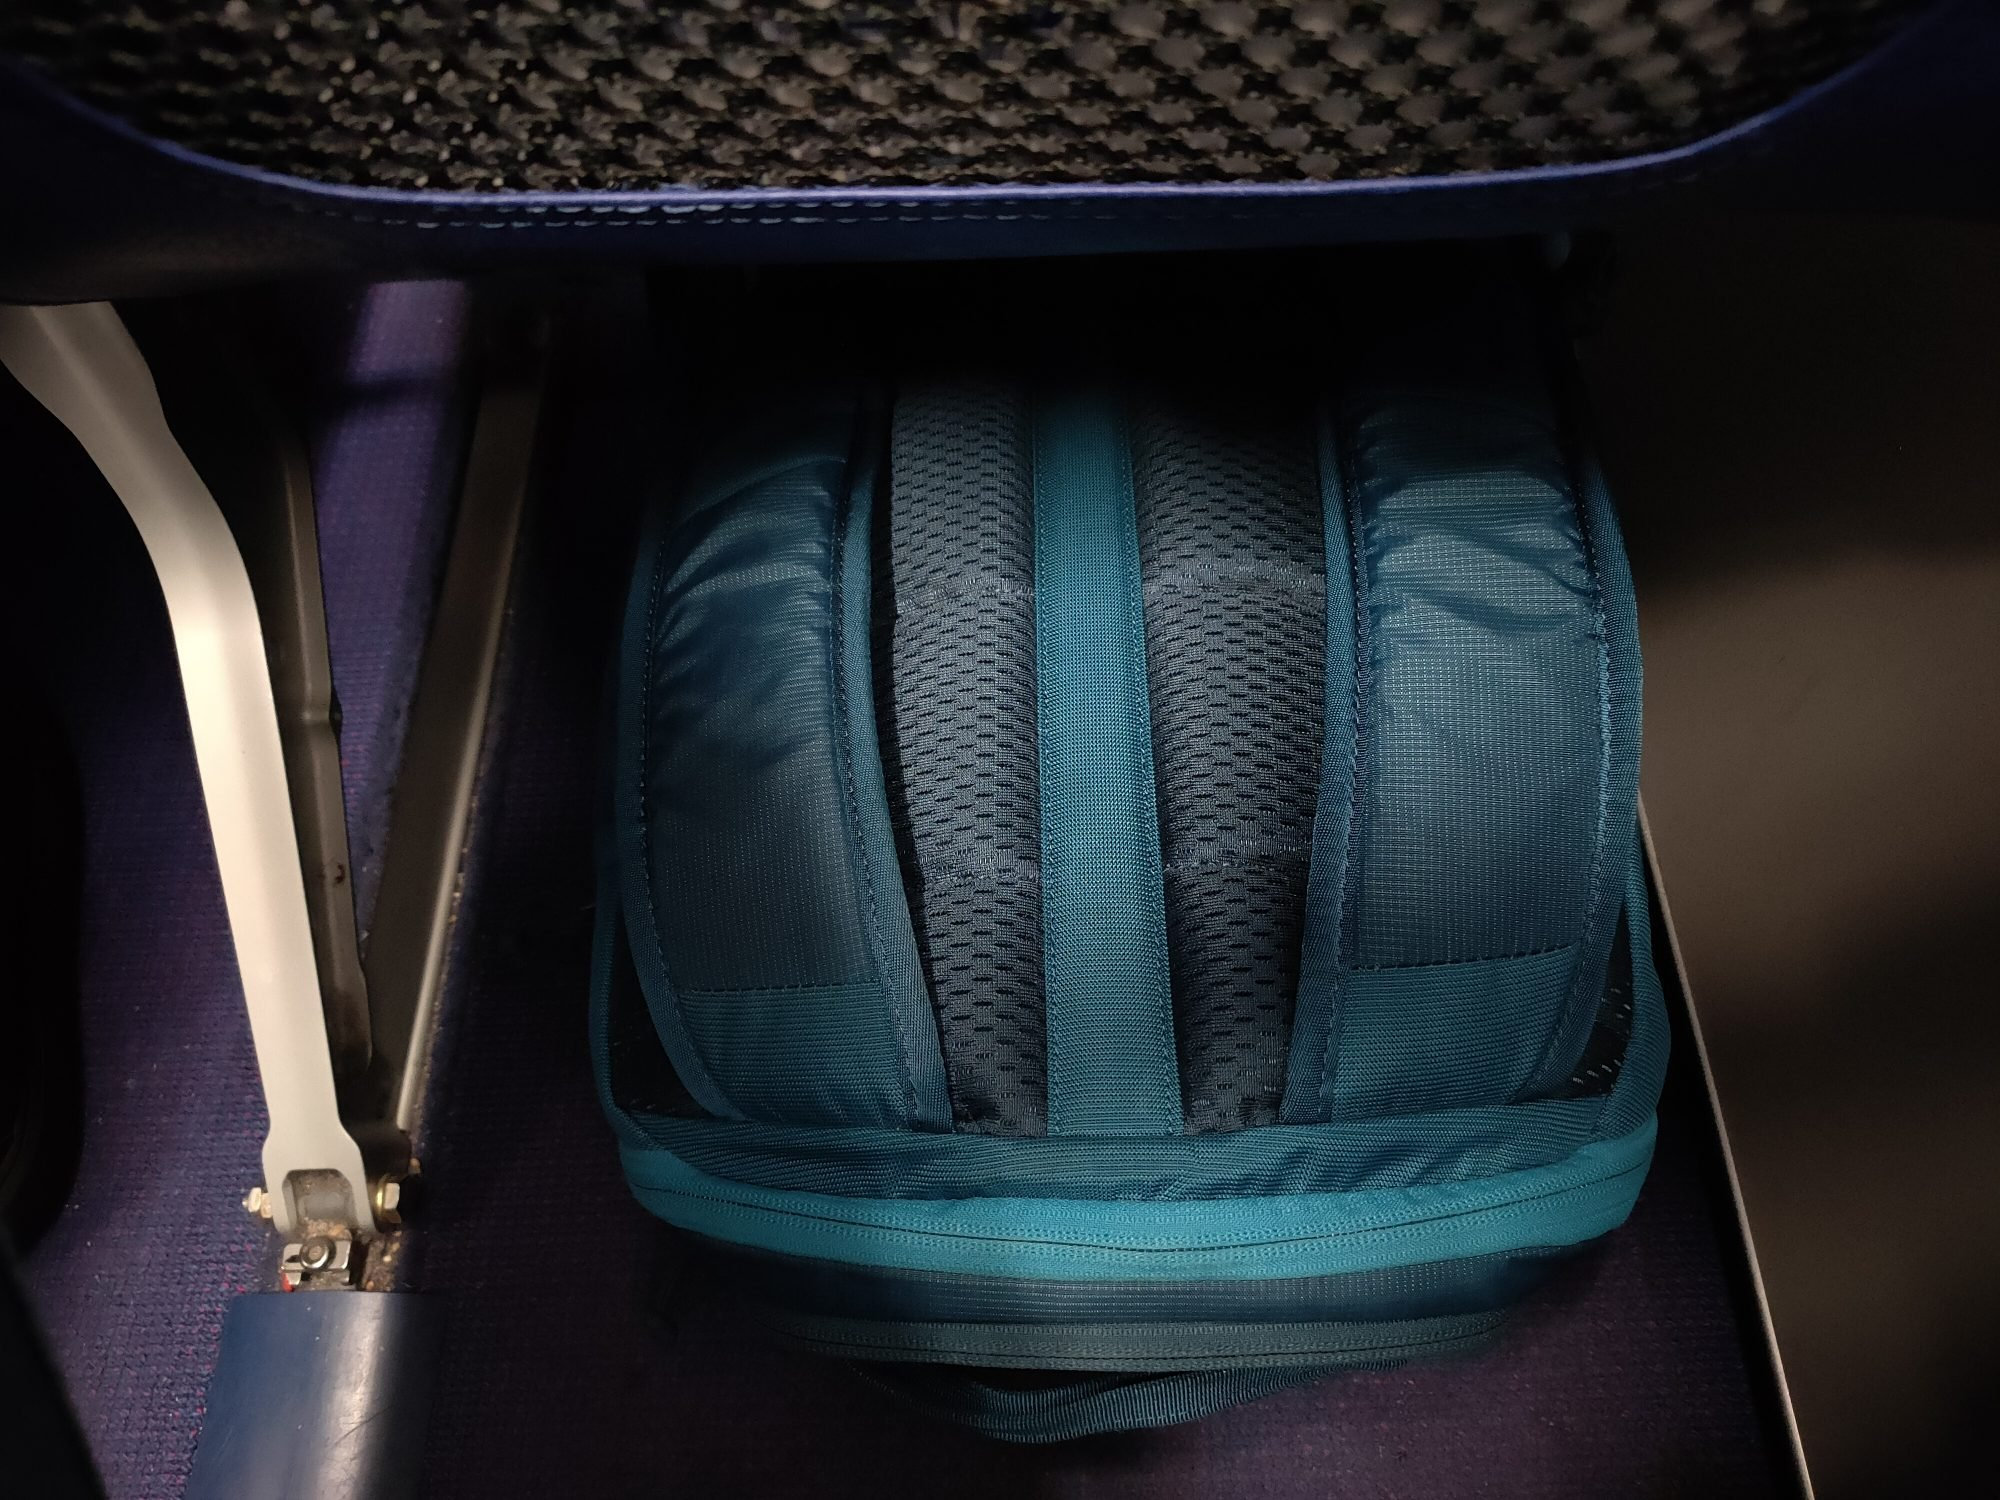 Thule EnRoute 23L - miejski plecak, który teraz kupisz o 57% taniej (opinia) 23